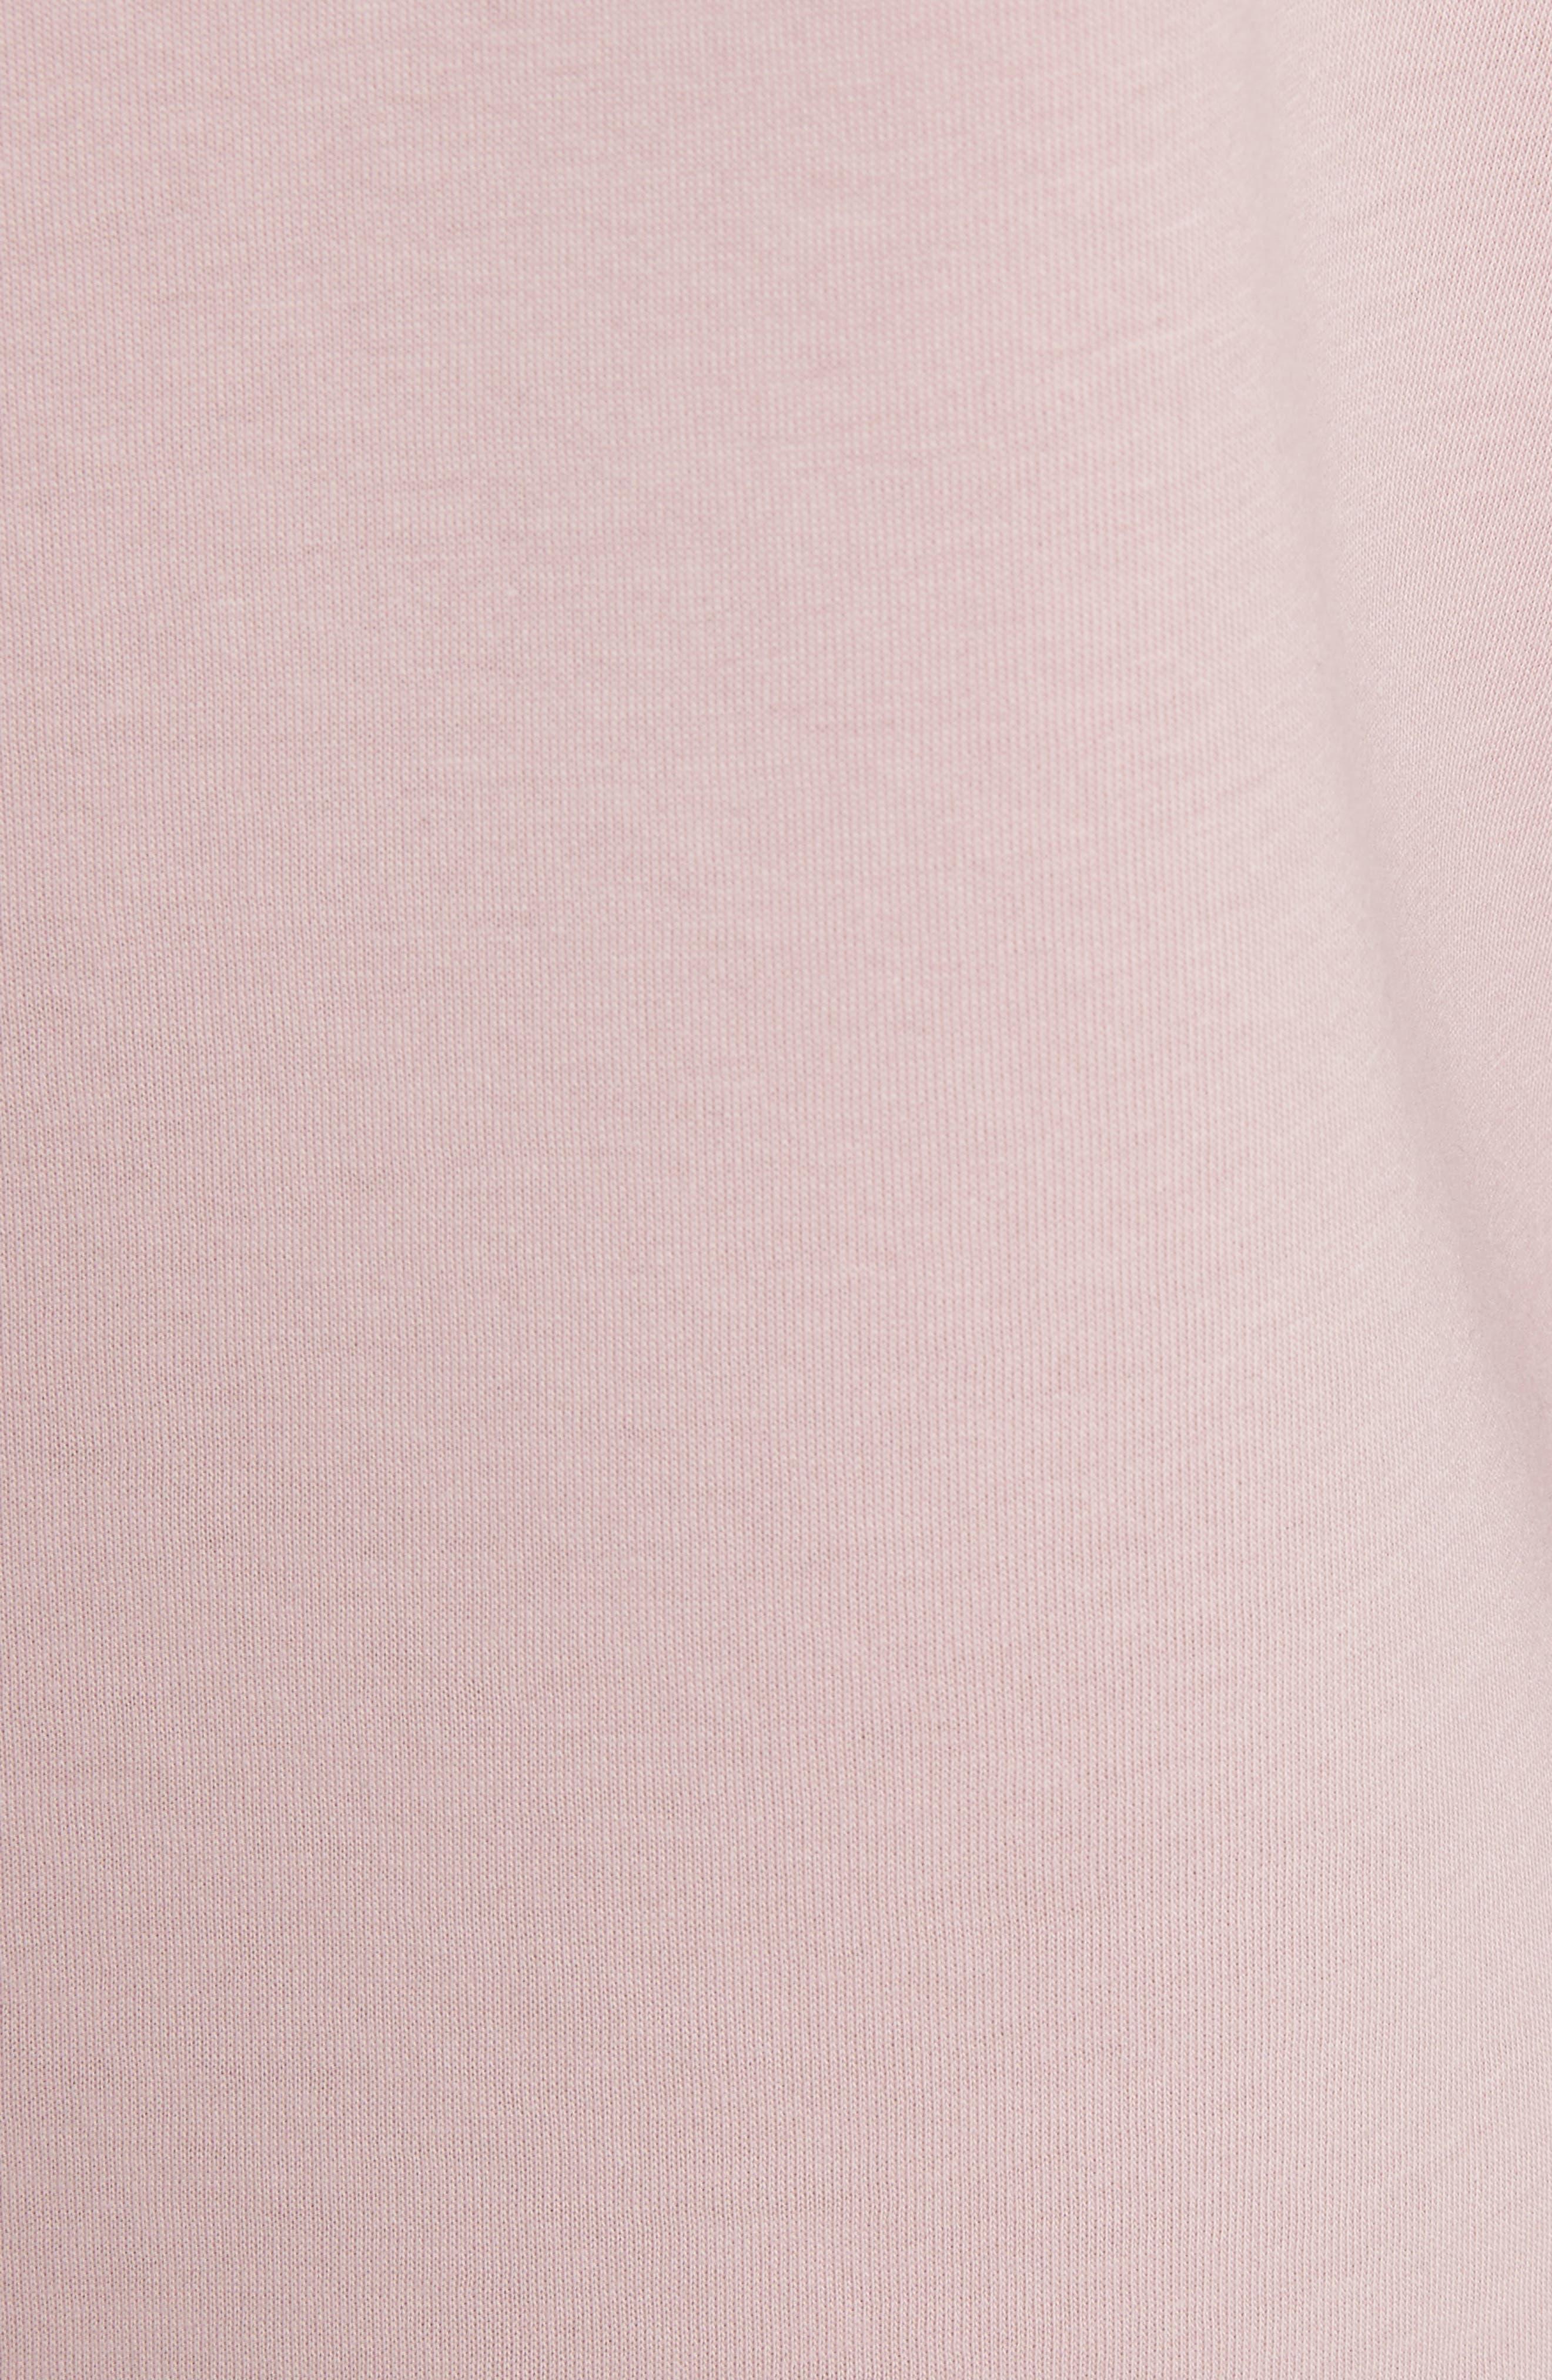 Orcher Full Sleeve Sweatshirt,                             Alternate thumbnail 5, color,                             Dusky Pink